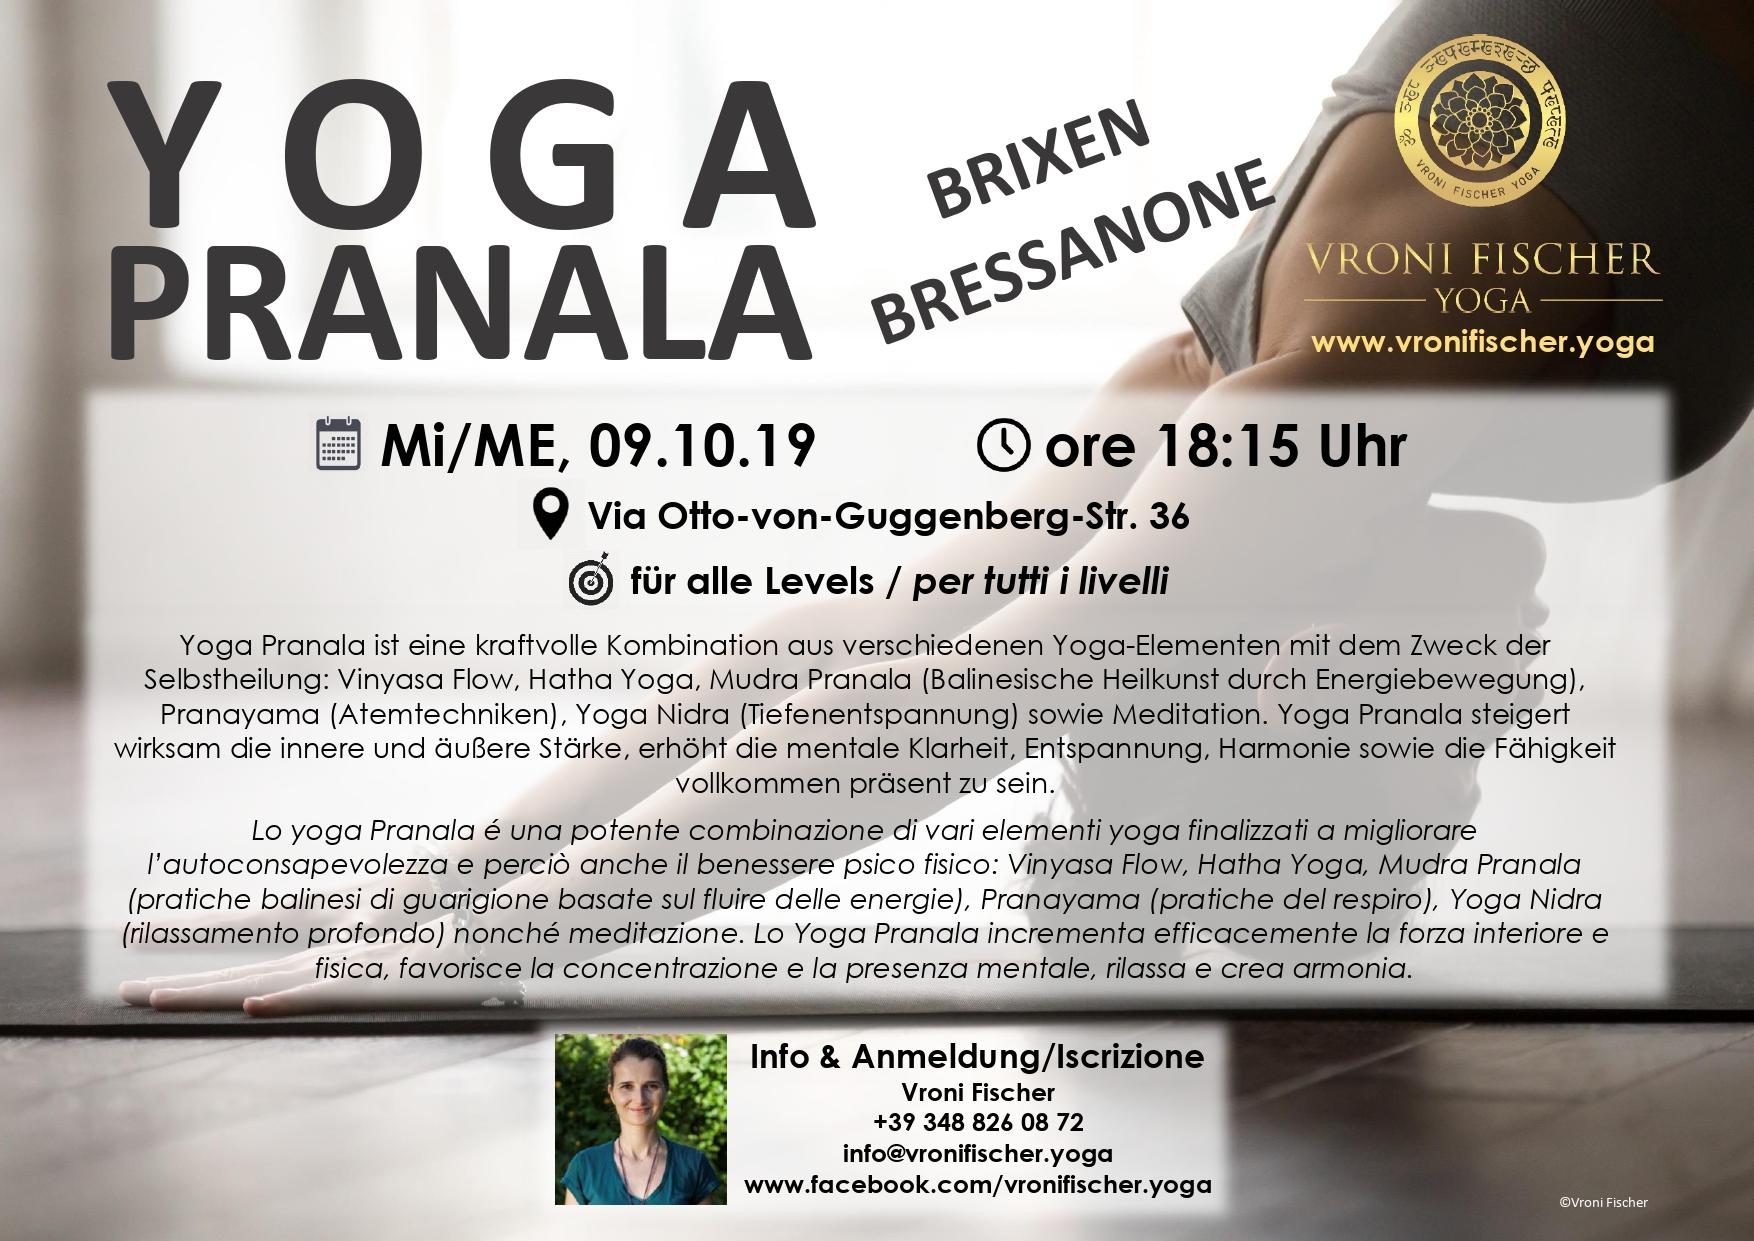 https://www.vronifischer.yoga/kurse-corsi/brixen-bressanone/